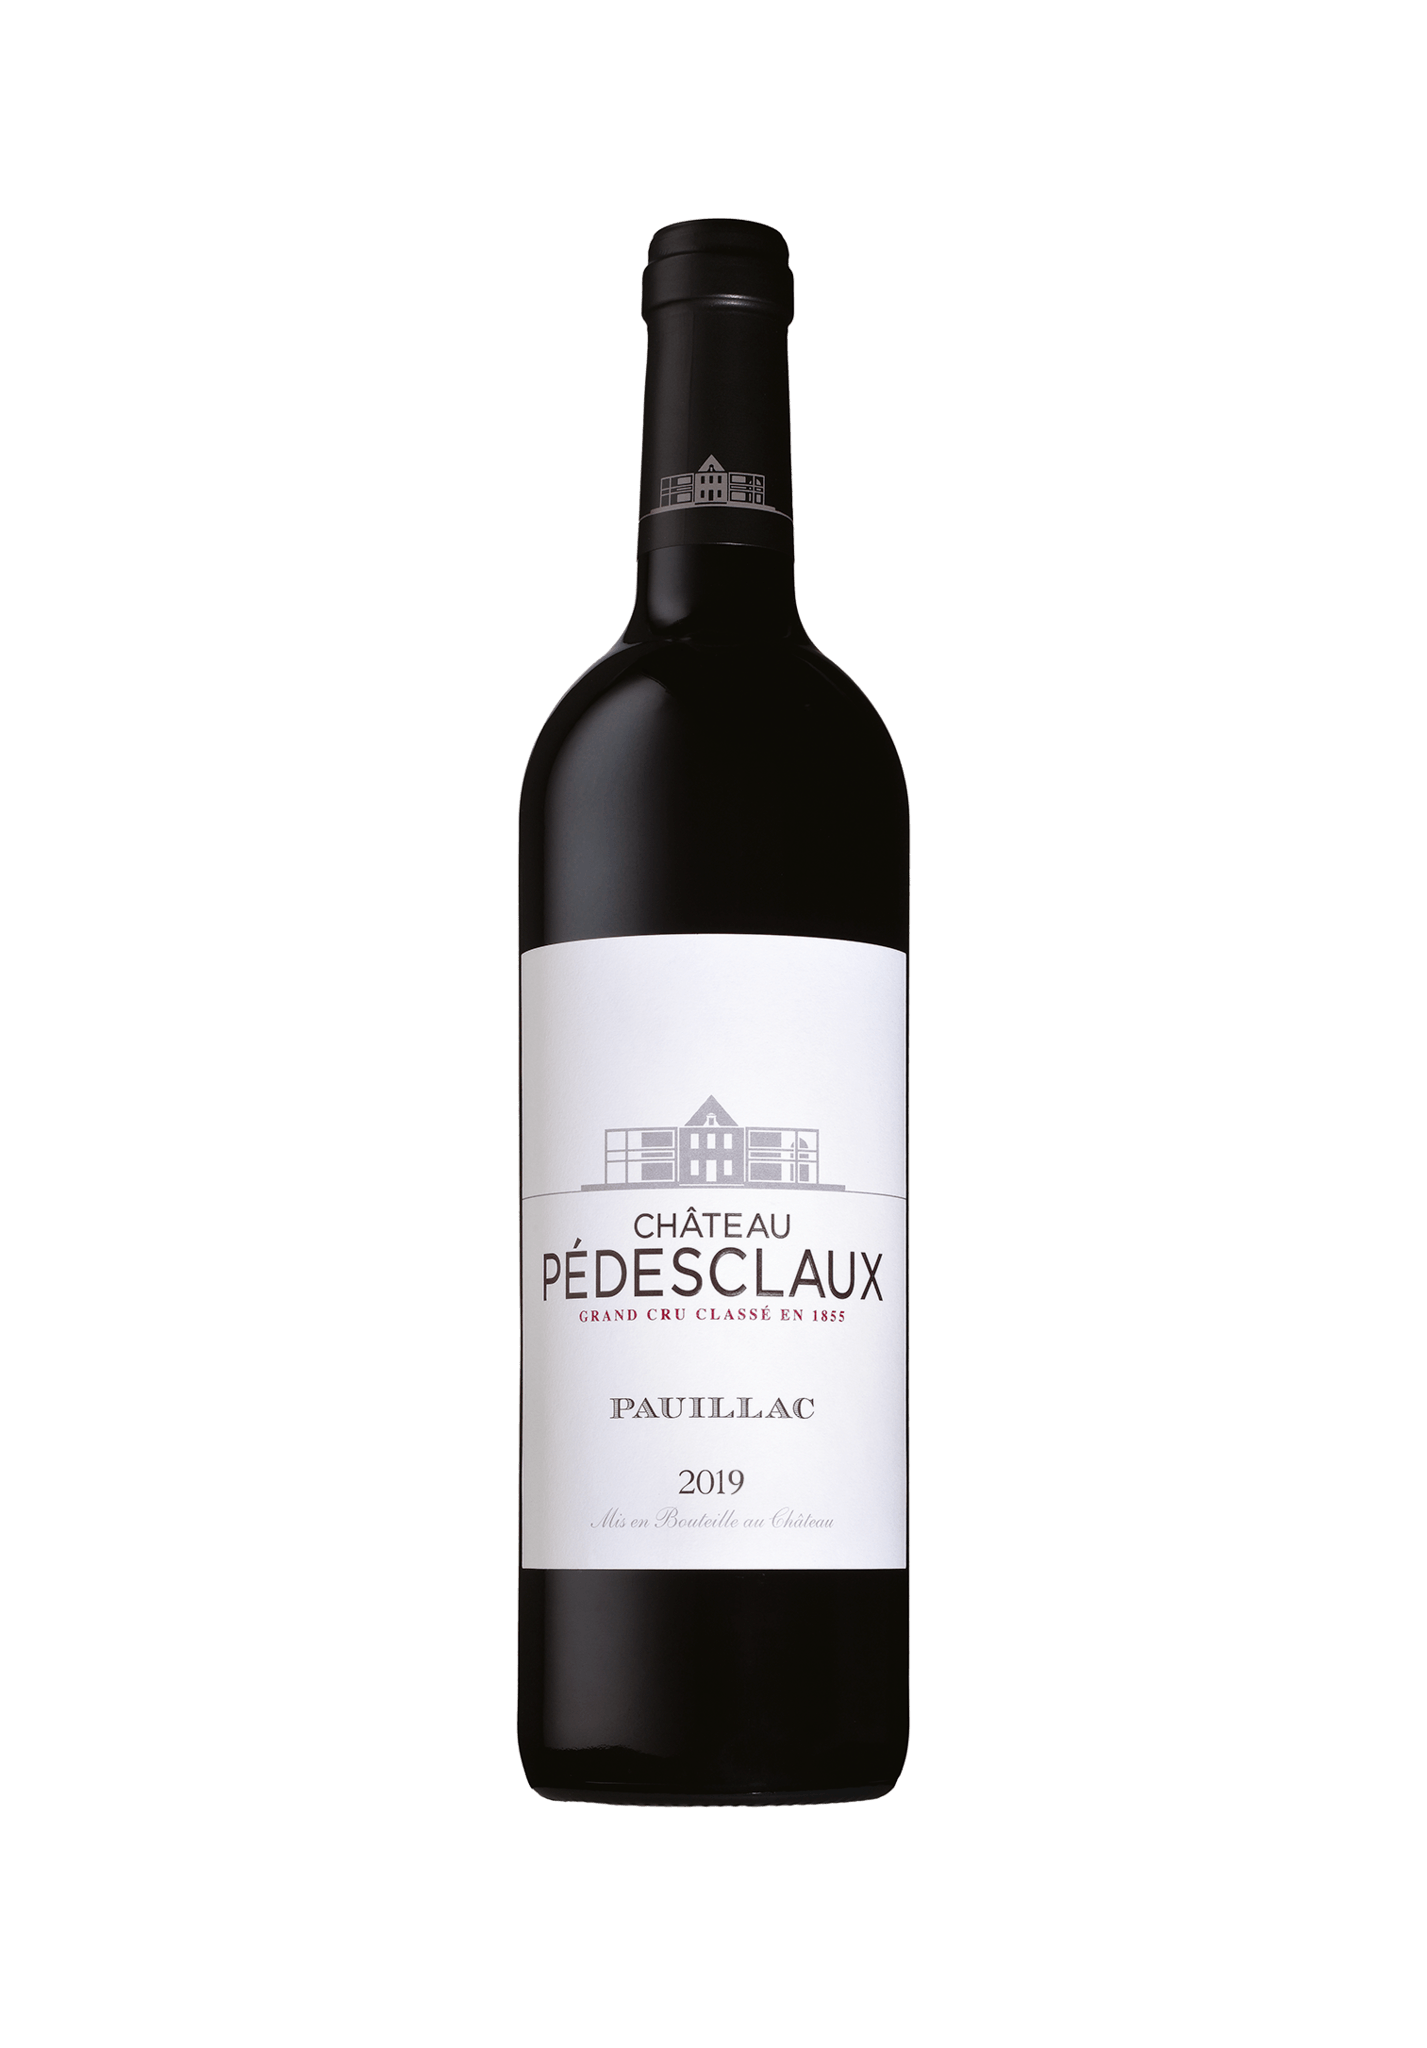 The Wines - Chateau Pedesclaux